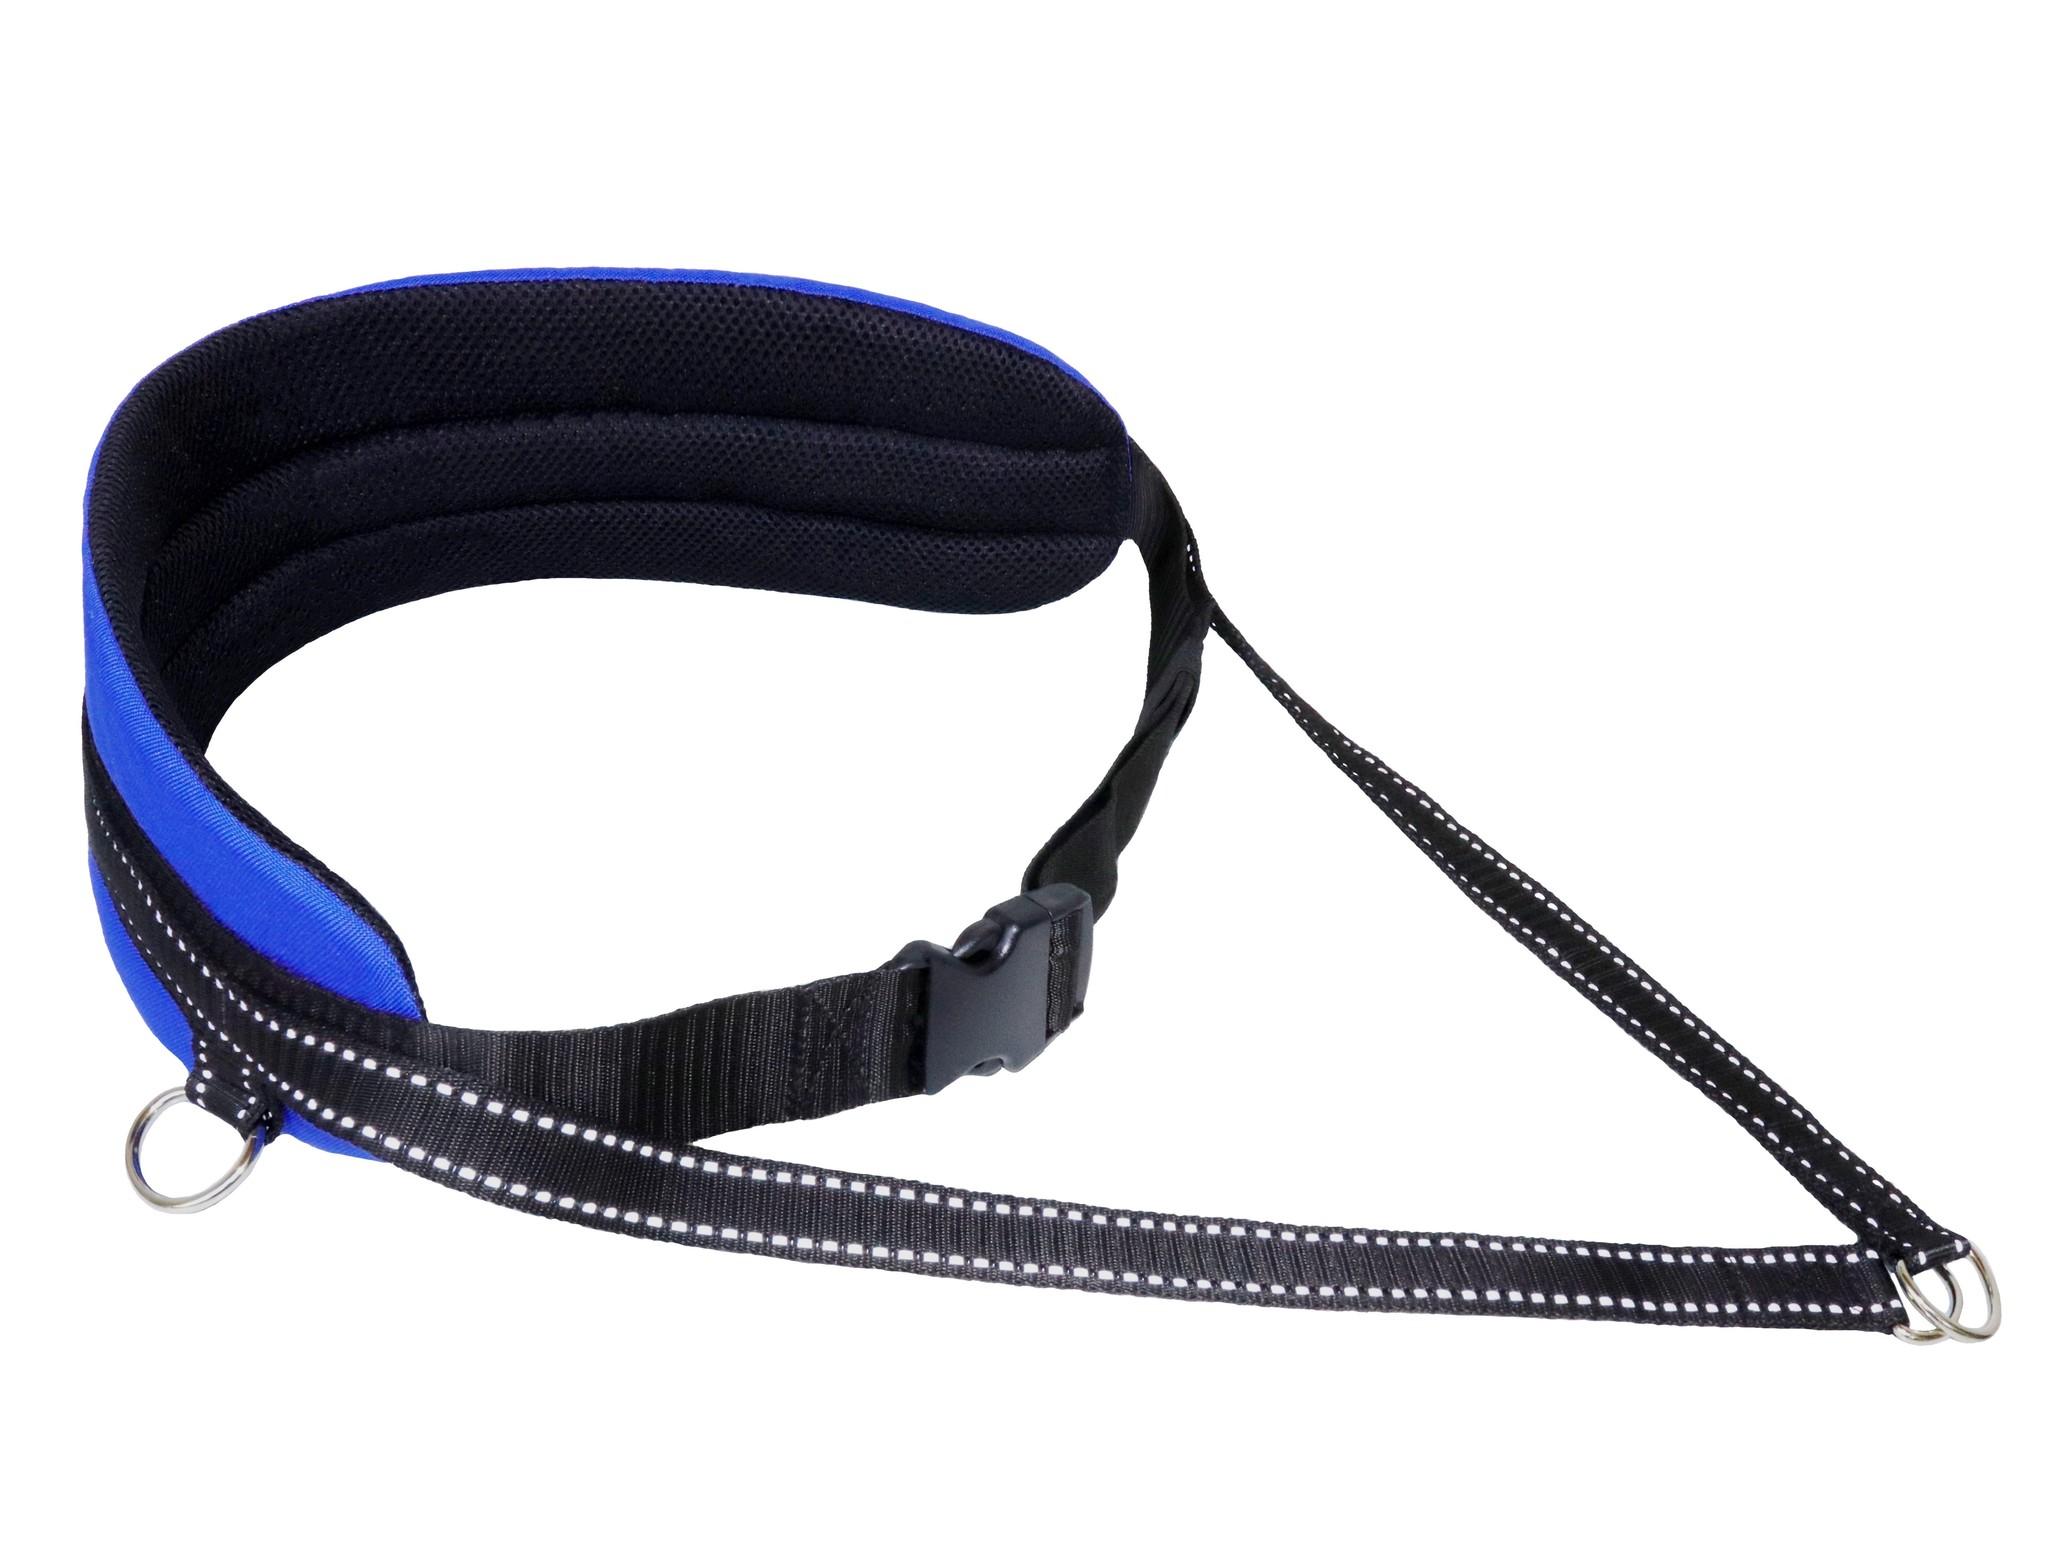 Northern Howl Handsfree Dog Walking Running Jogging Waist Belt - blue